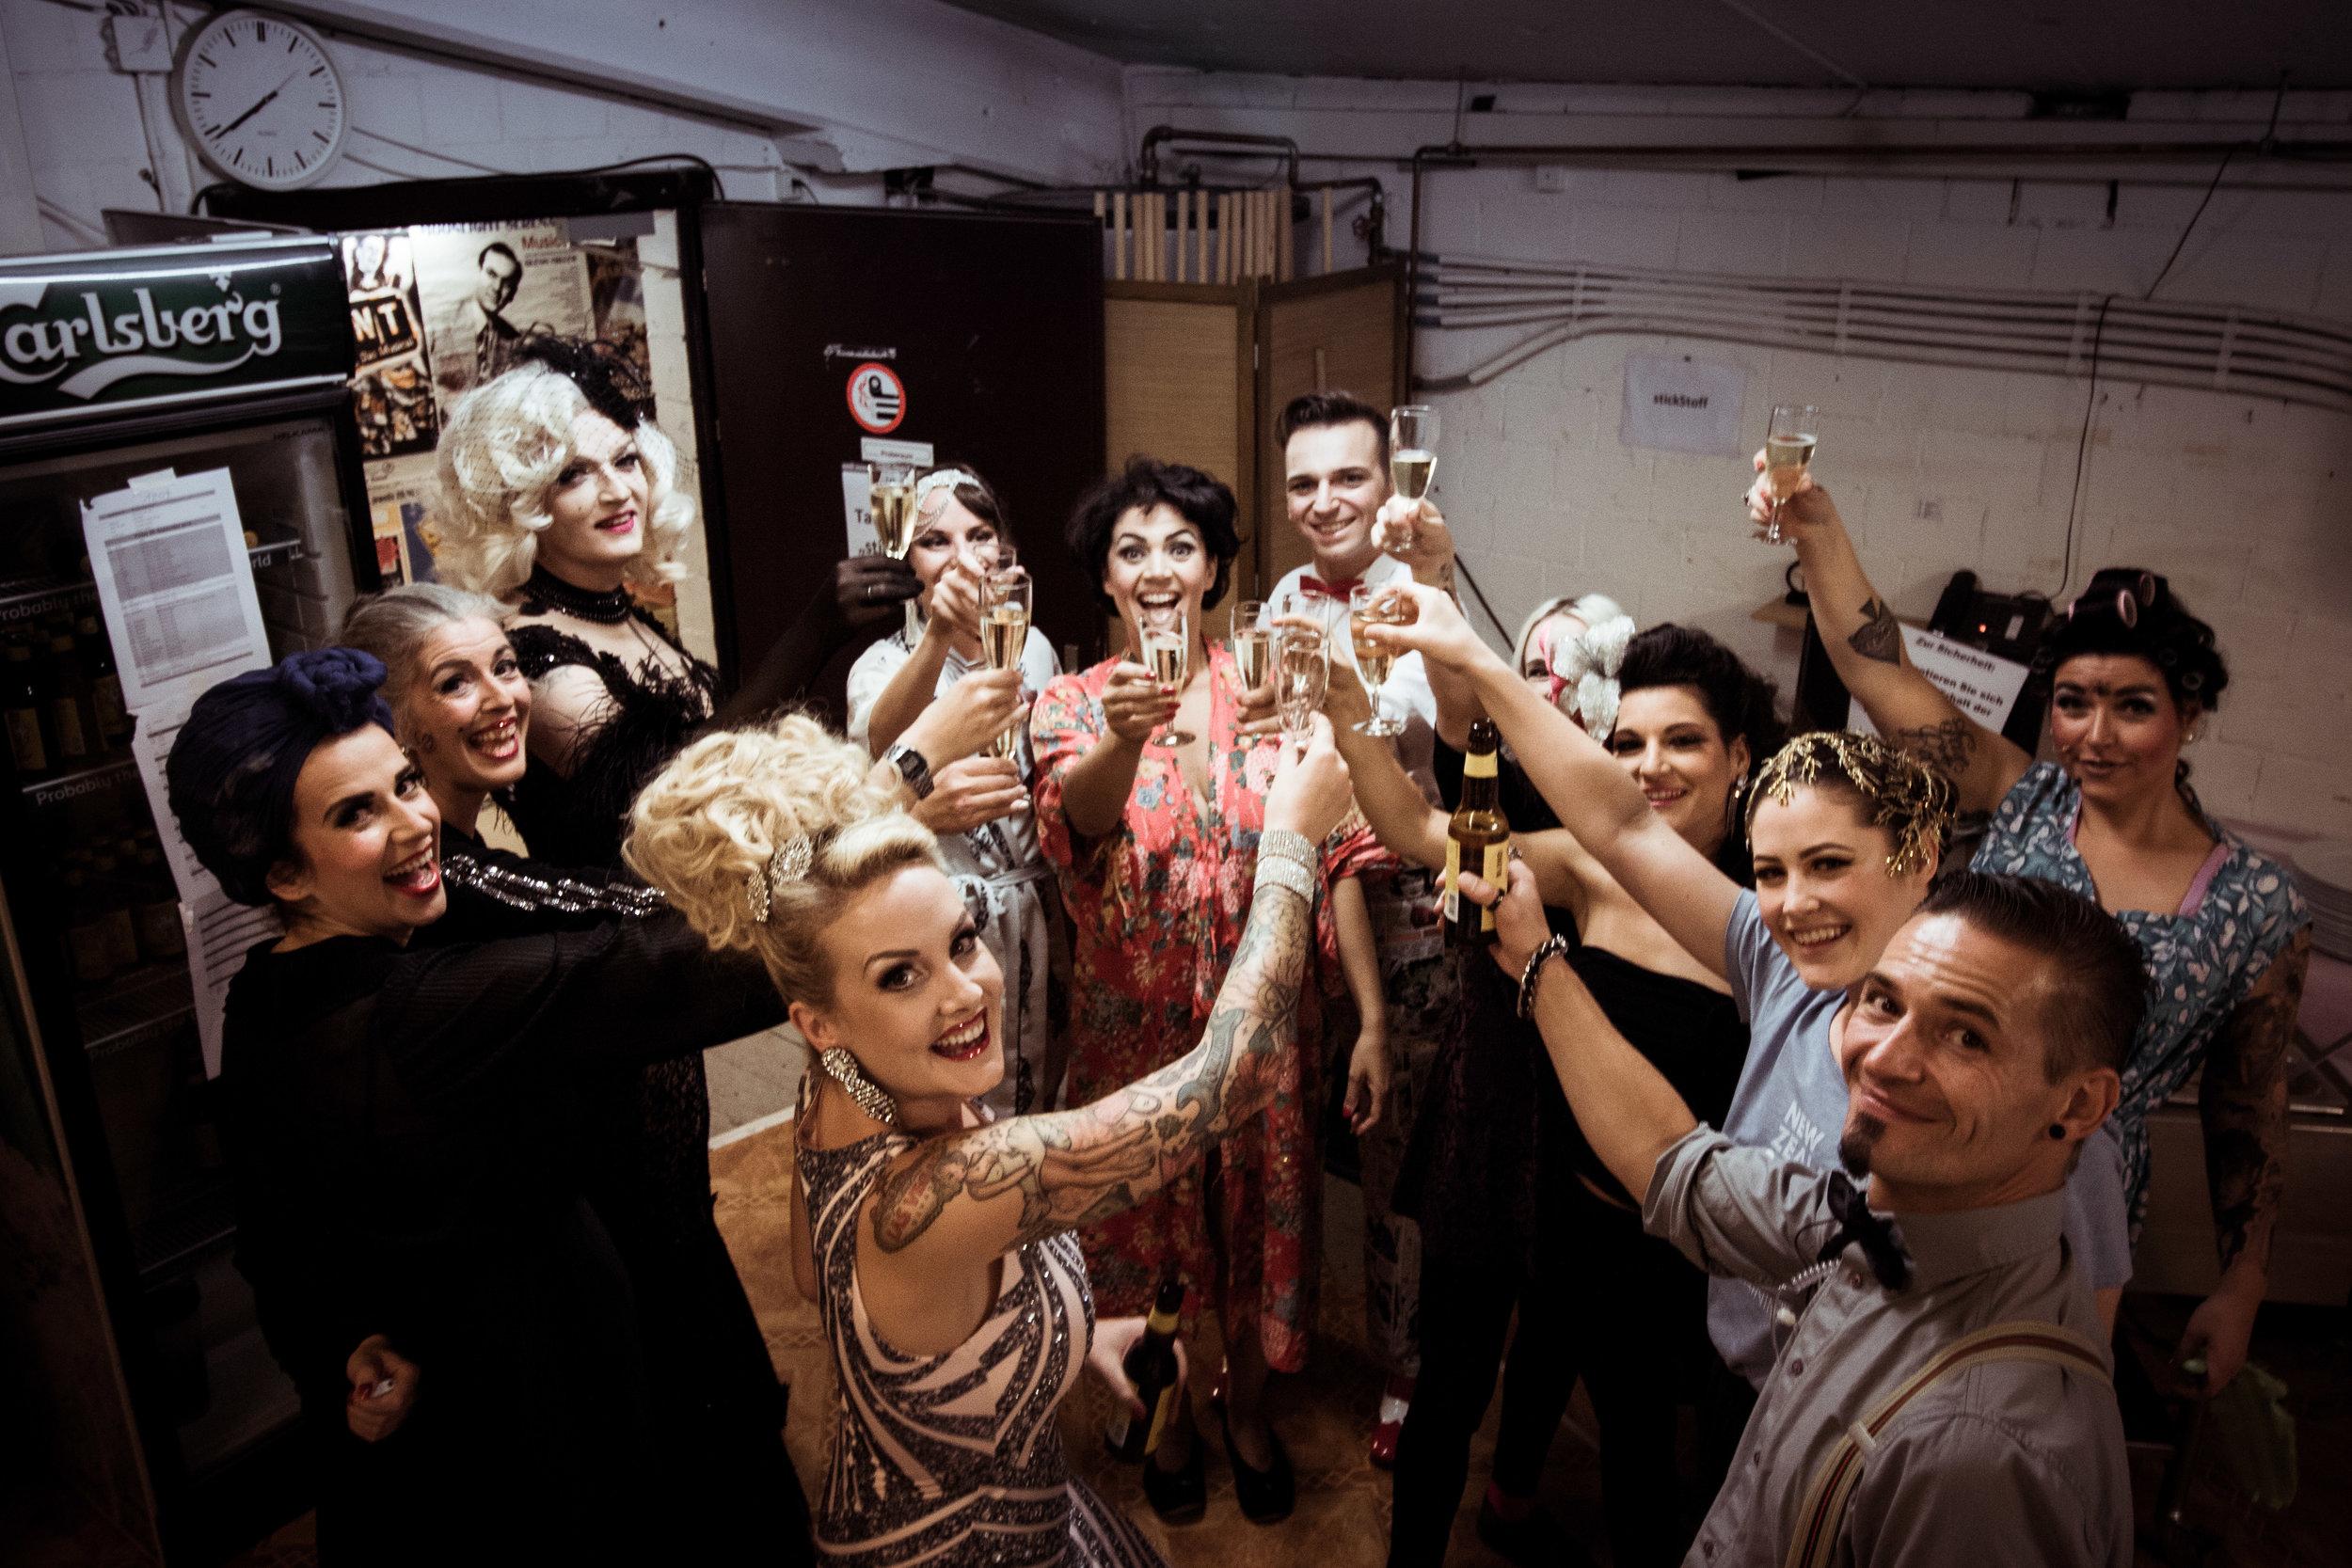 Swiss Burlesque Festival 2018 by Dirk Behlau-3431.jpg